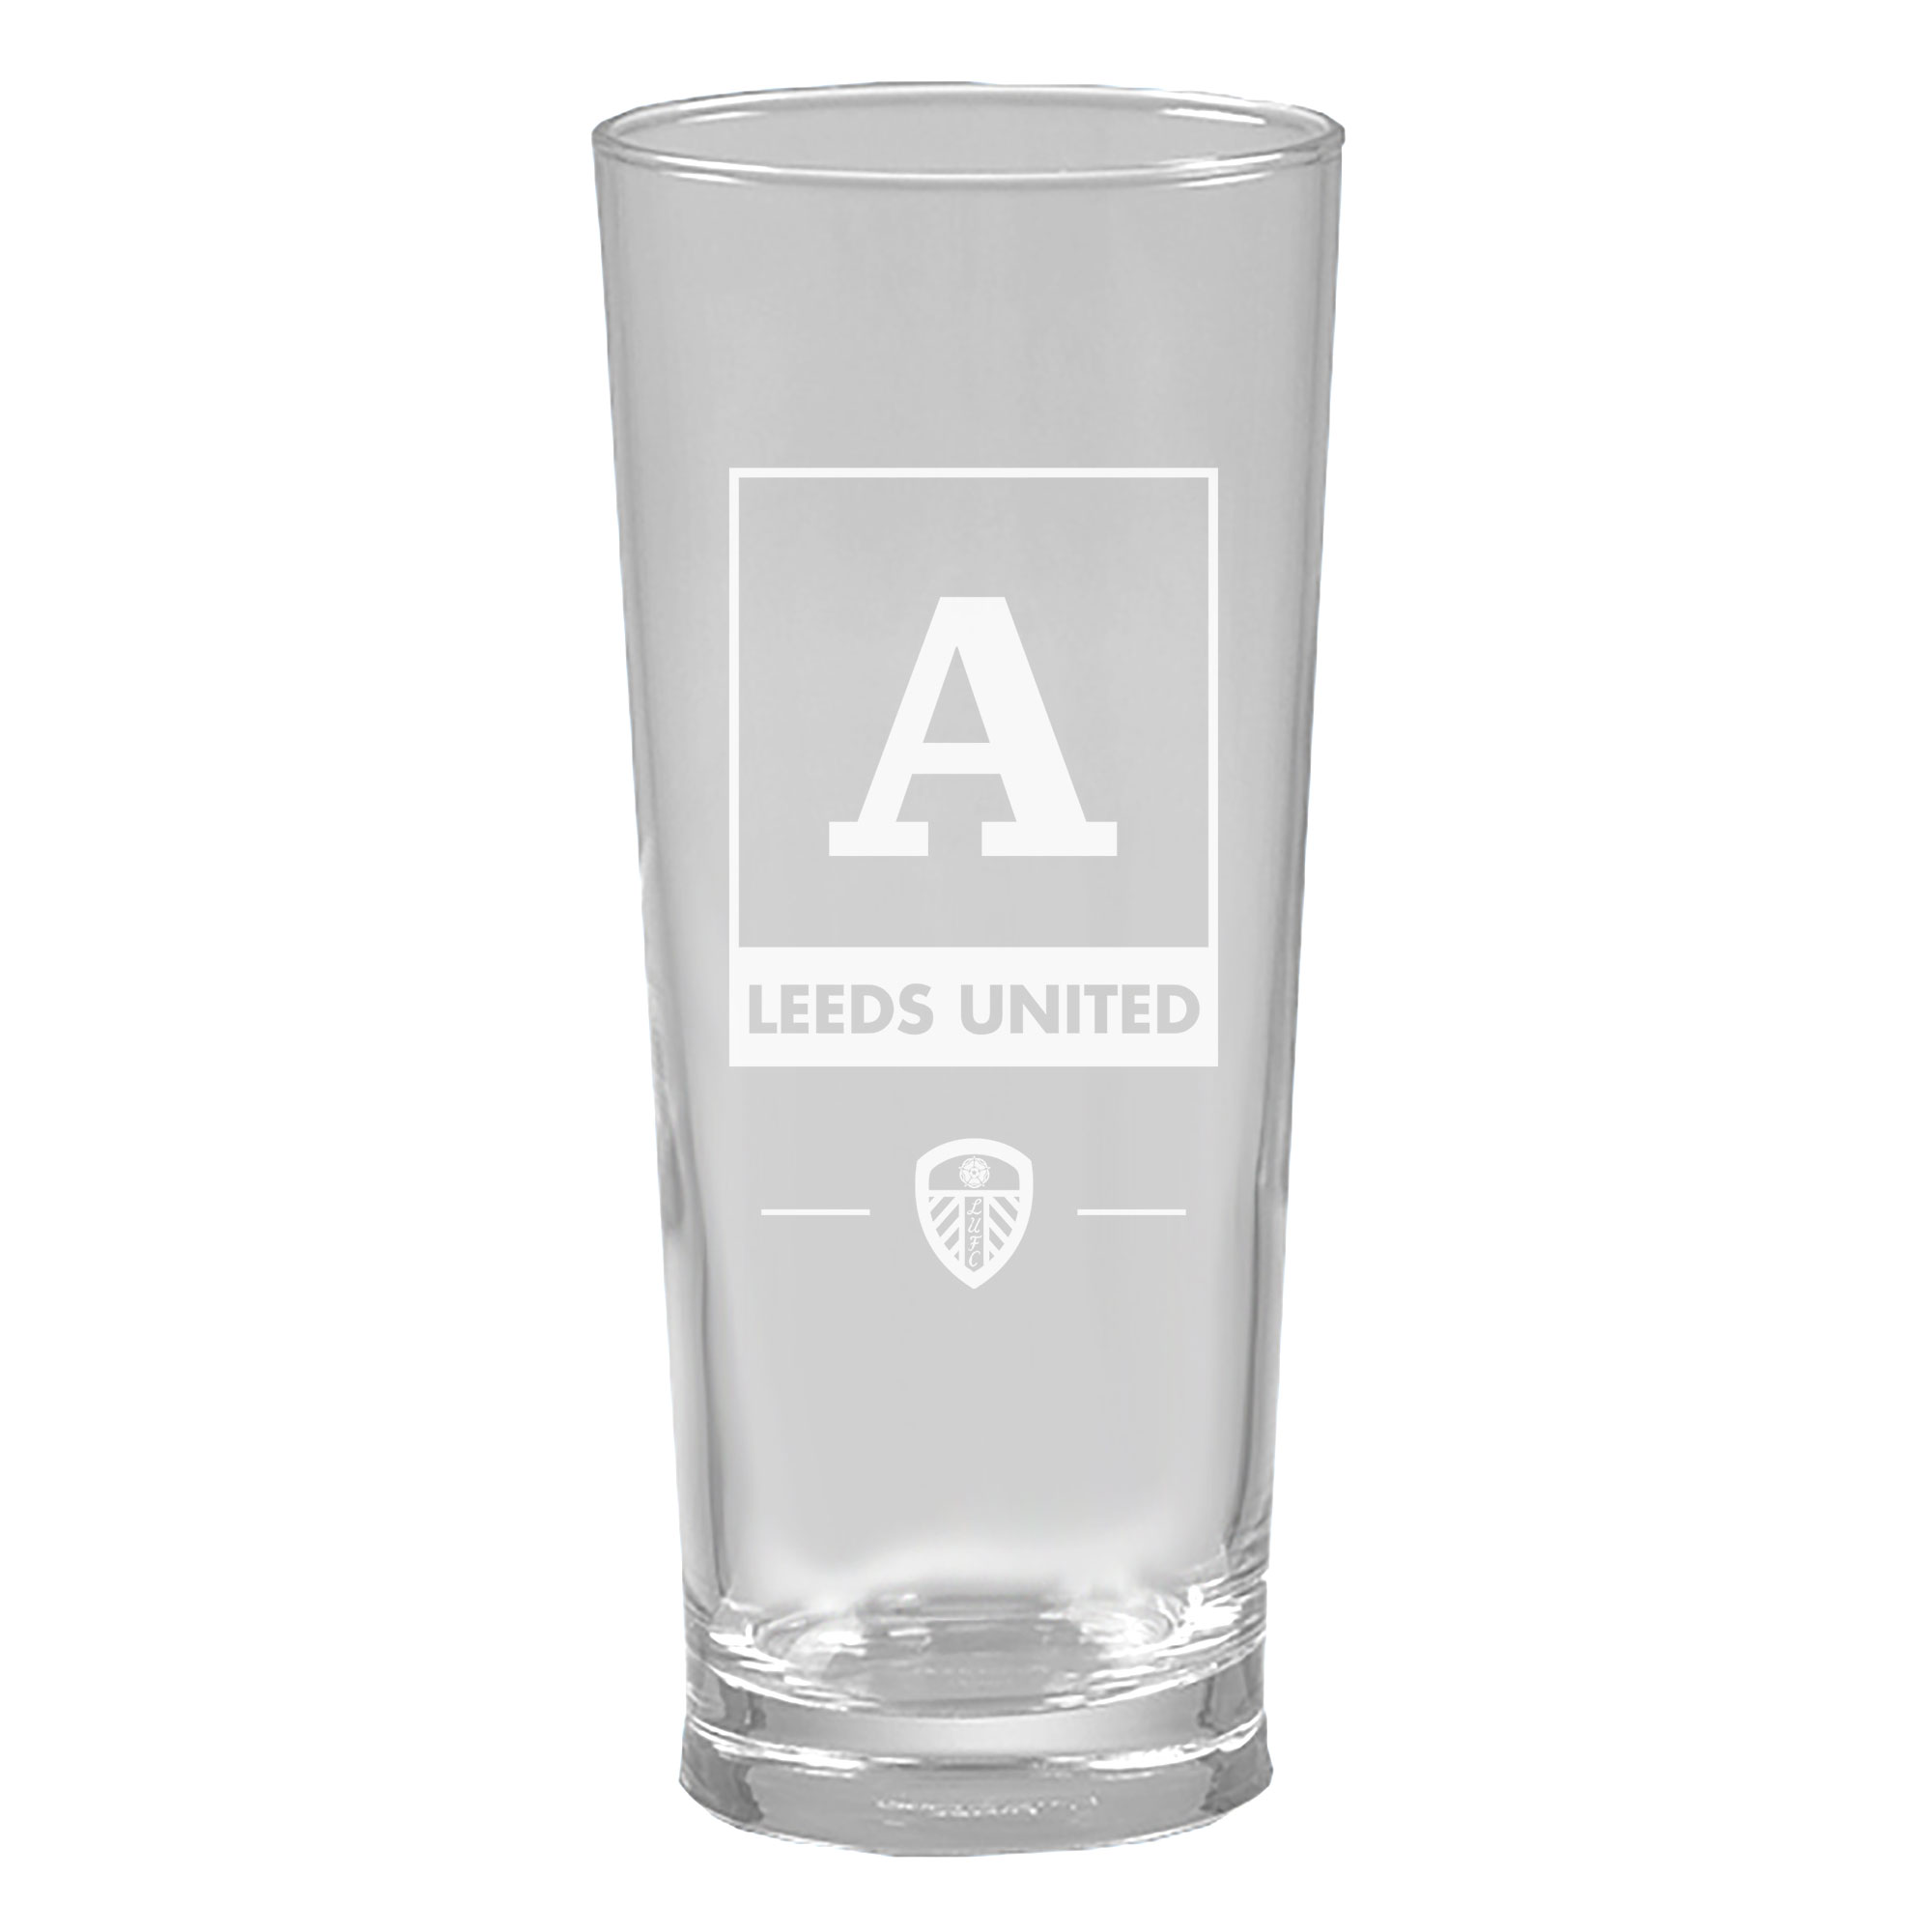 Leeds United FC Monogram Straight Sided Beer Glass